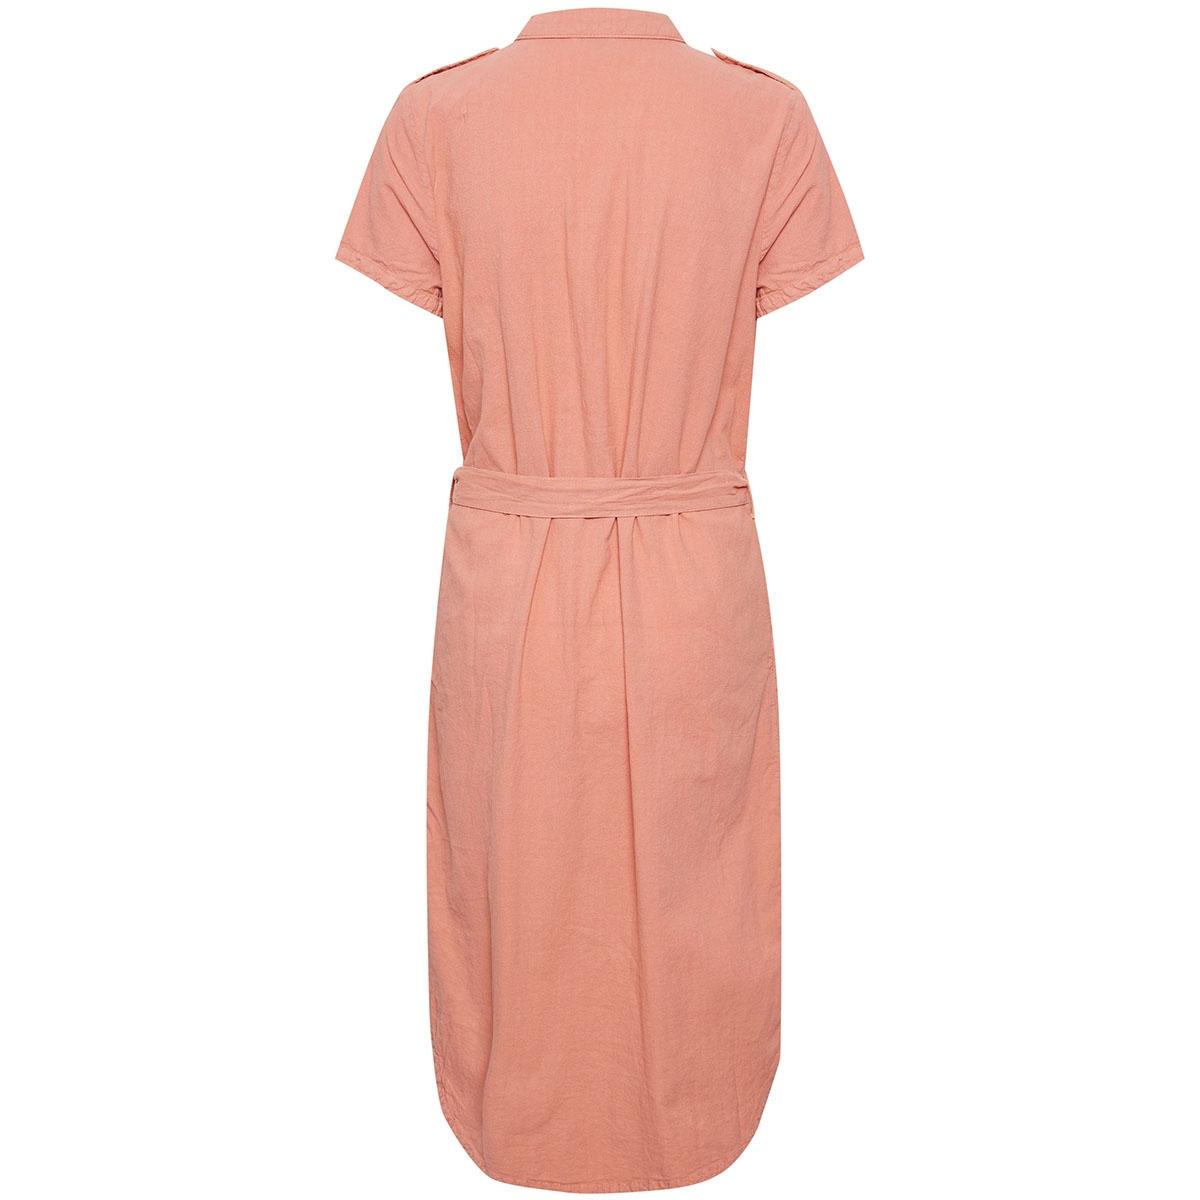 katesz dress 30510115 saint tropez jurk 161526